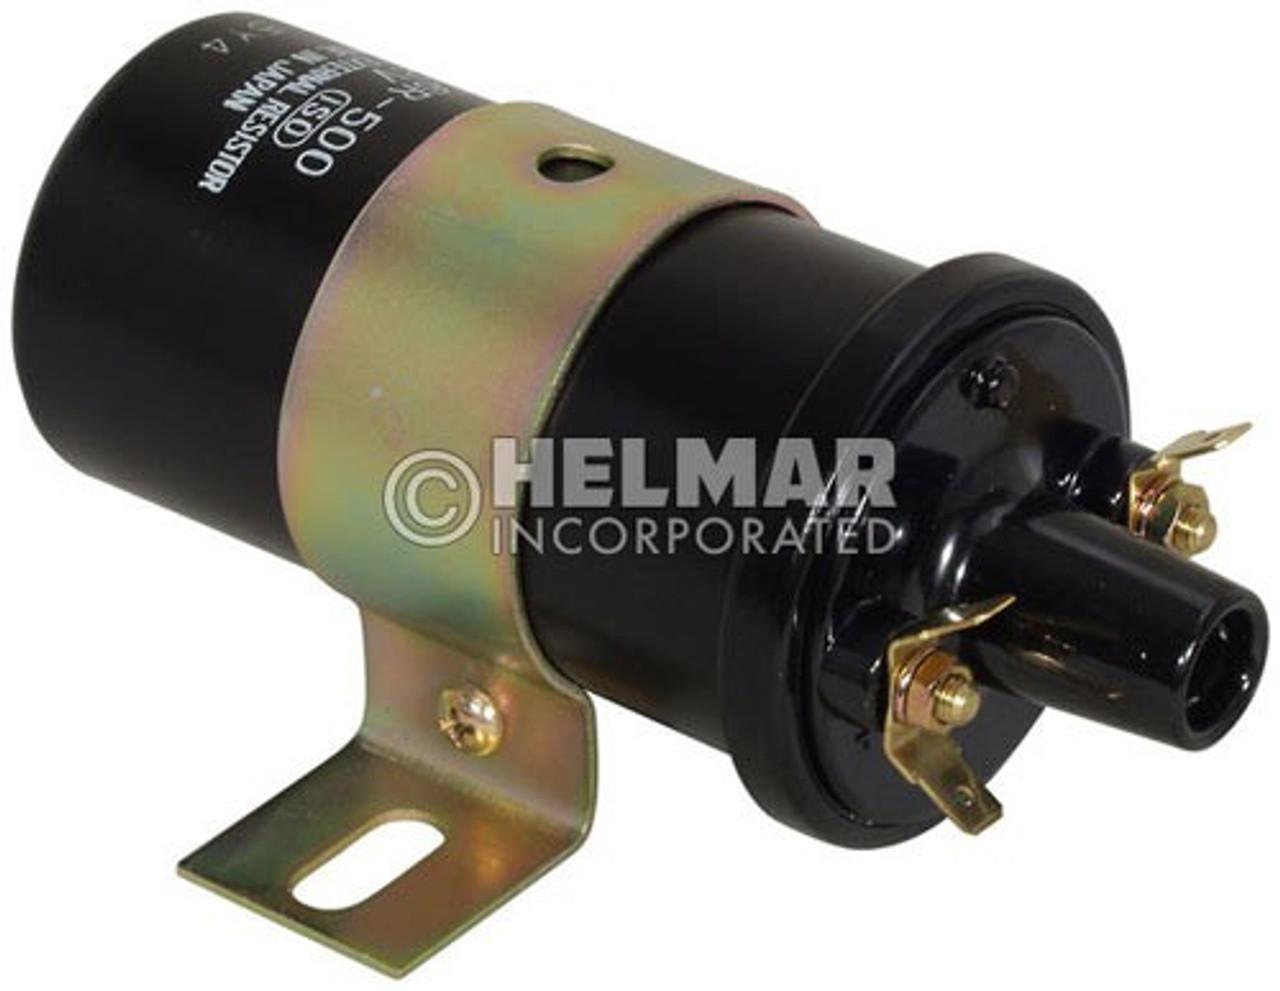 MM115566 Mitsi/Cat Original Hitachi Ignition Coil, 12 Volt External Resistor, Type B